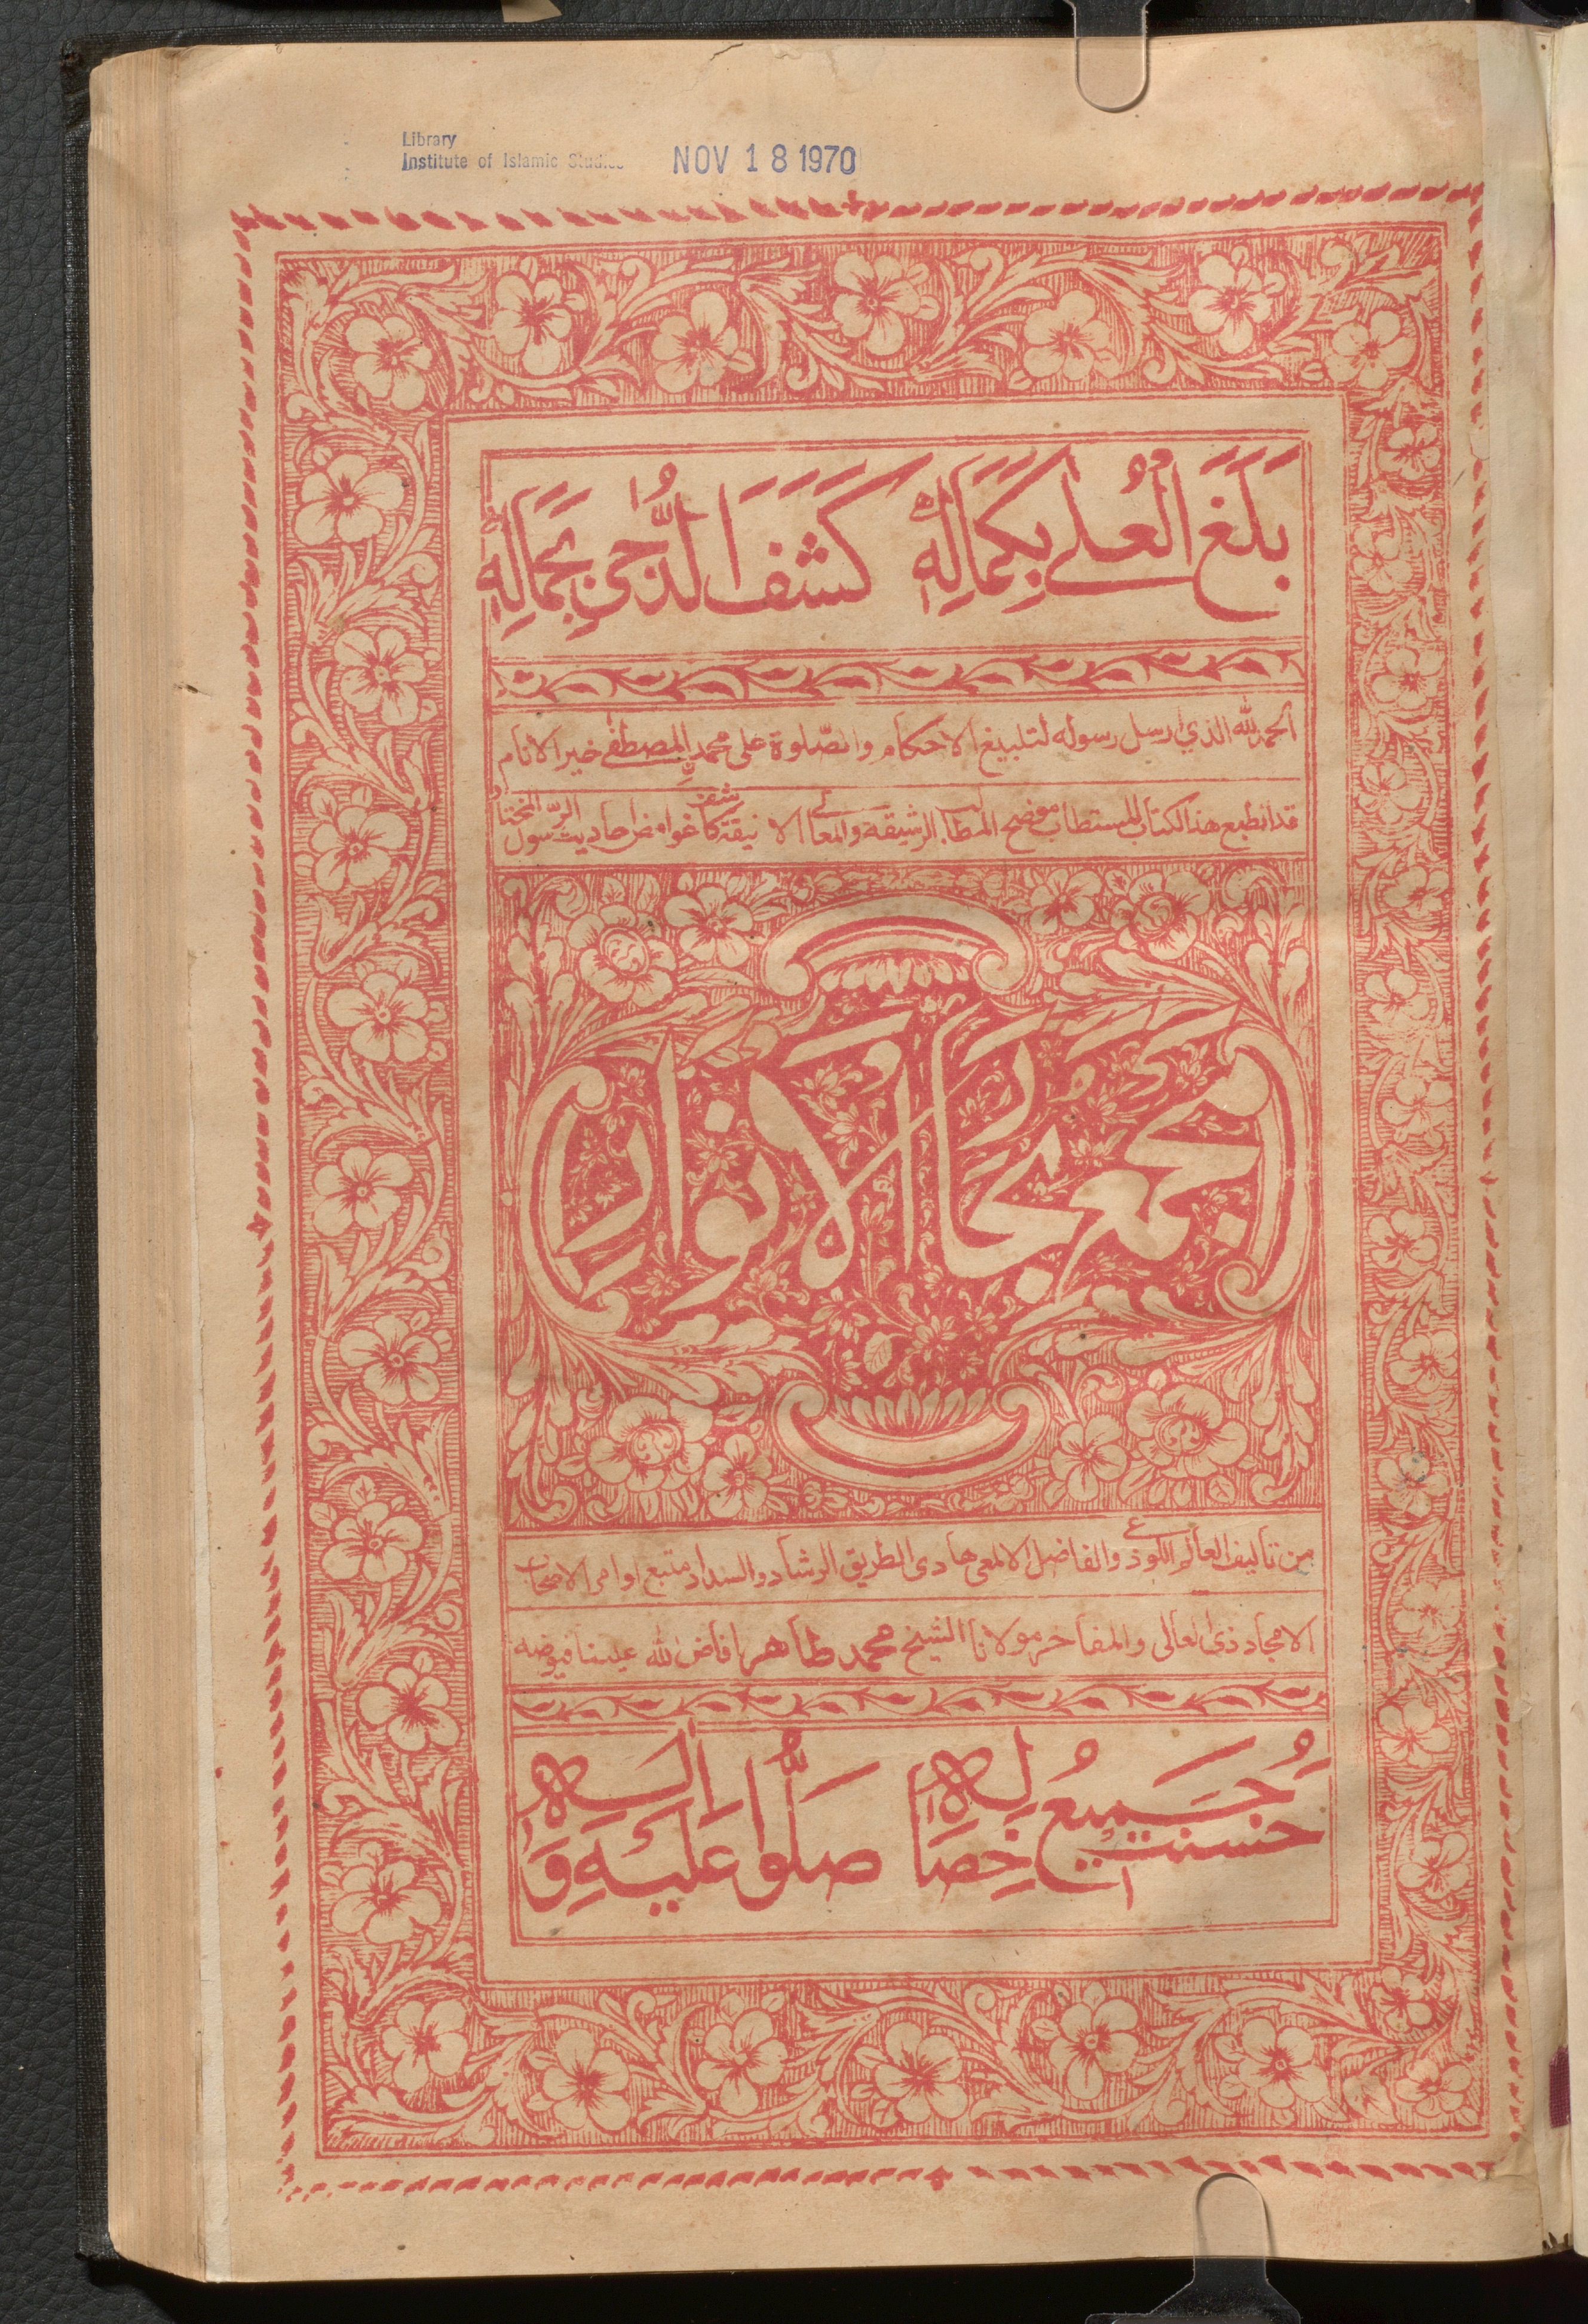 Tūnisī, Muḥammad ibn ʻUmar. Hādhā kitāb Tashhīdh al-adhhān bi-sīrat bilād al-ʻArab wa-al-Sūdān. Paris  Duprat, 1850.